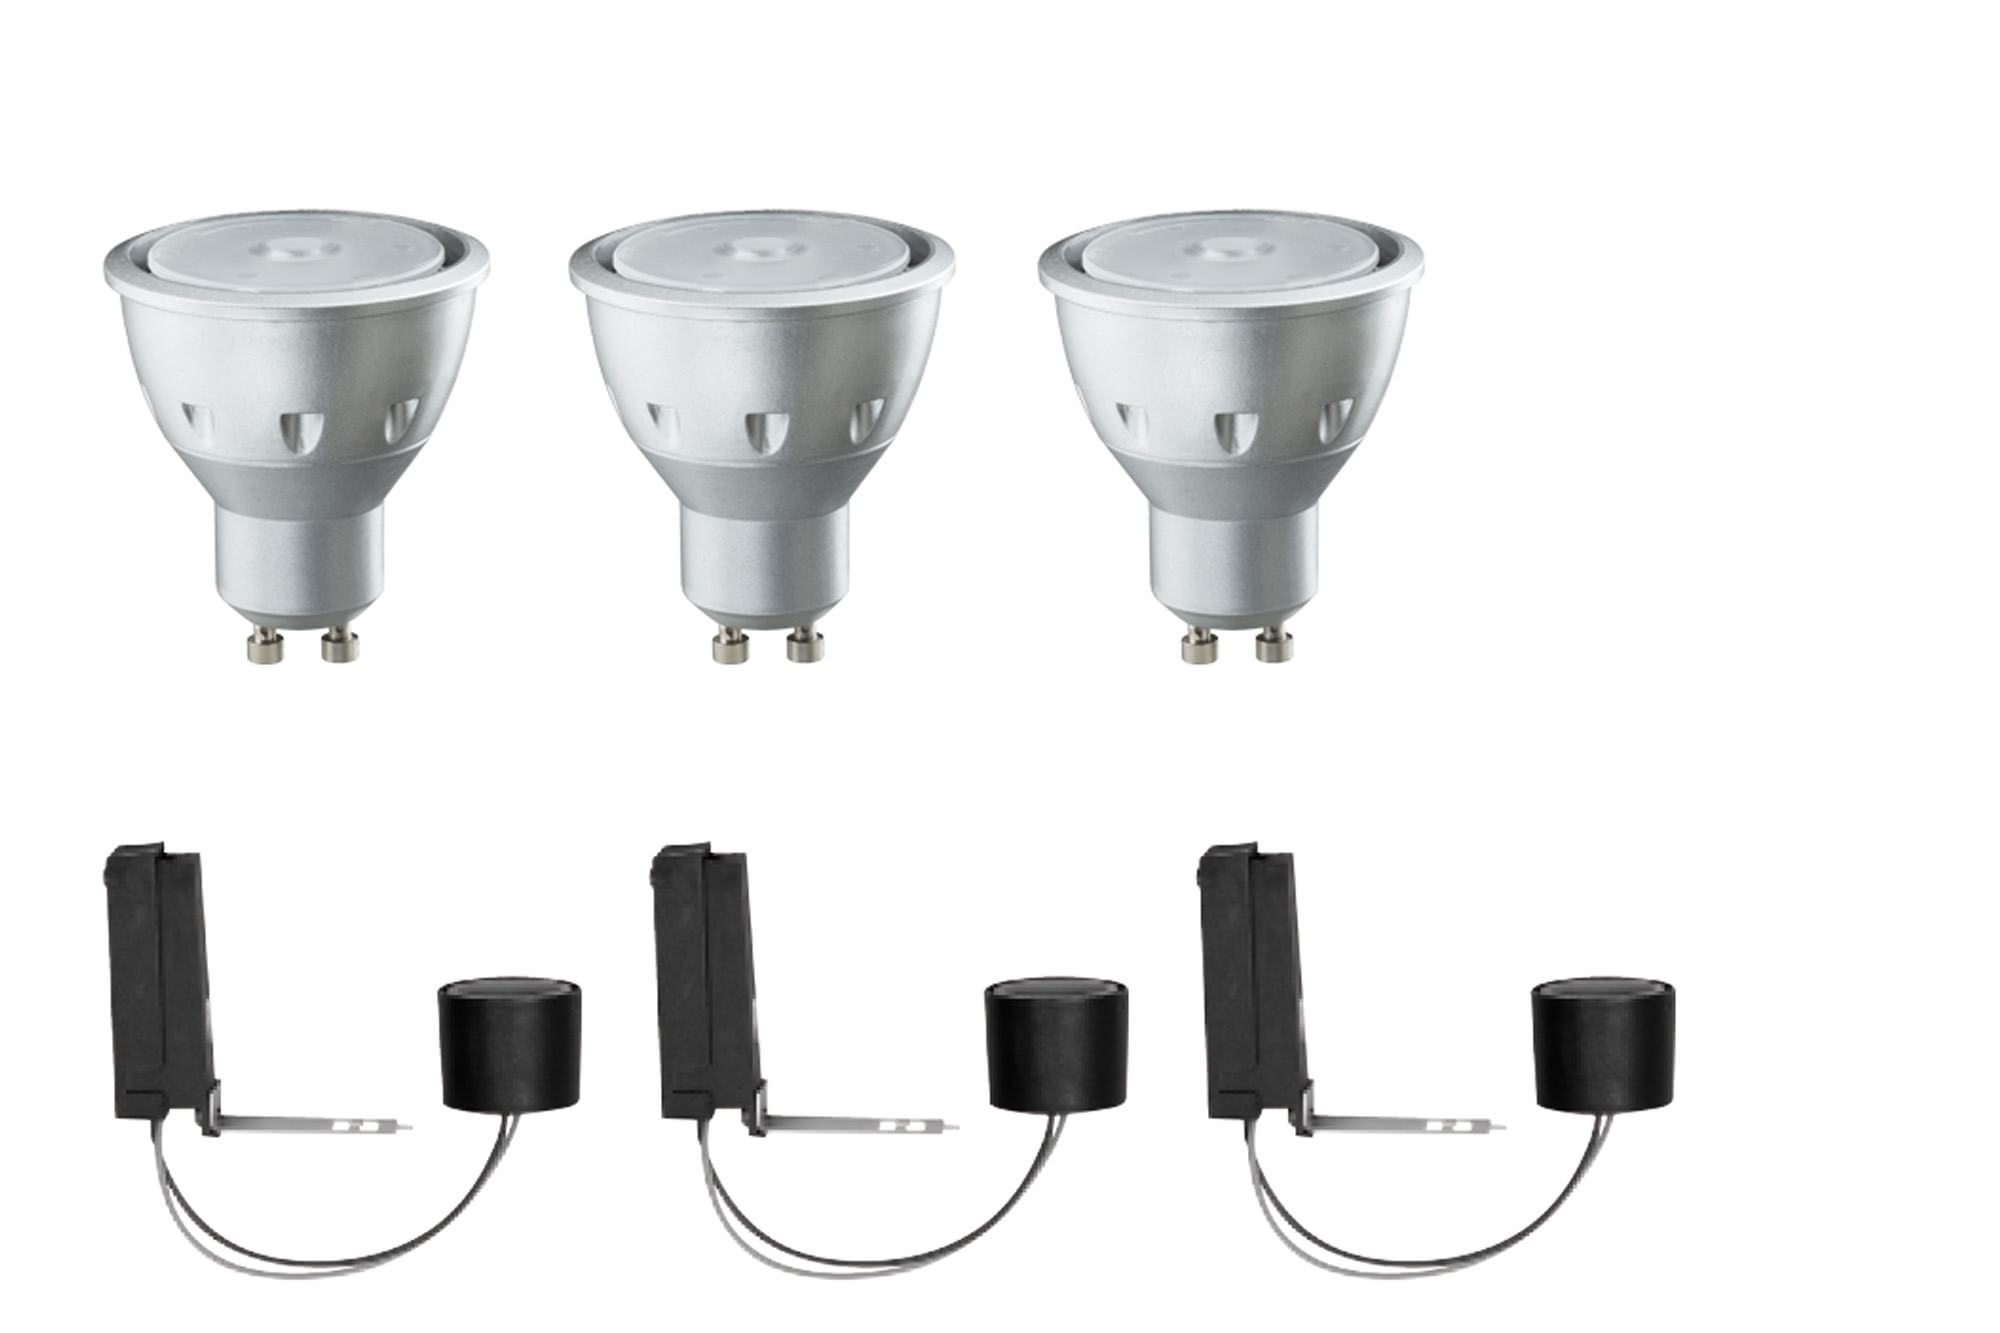 Paulmann. 92606 2Easy EBL Basis LED 3x3,5W GU10